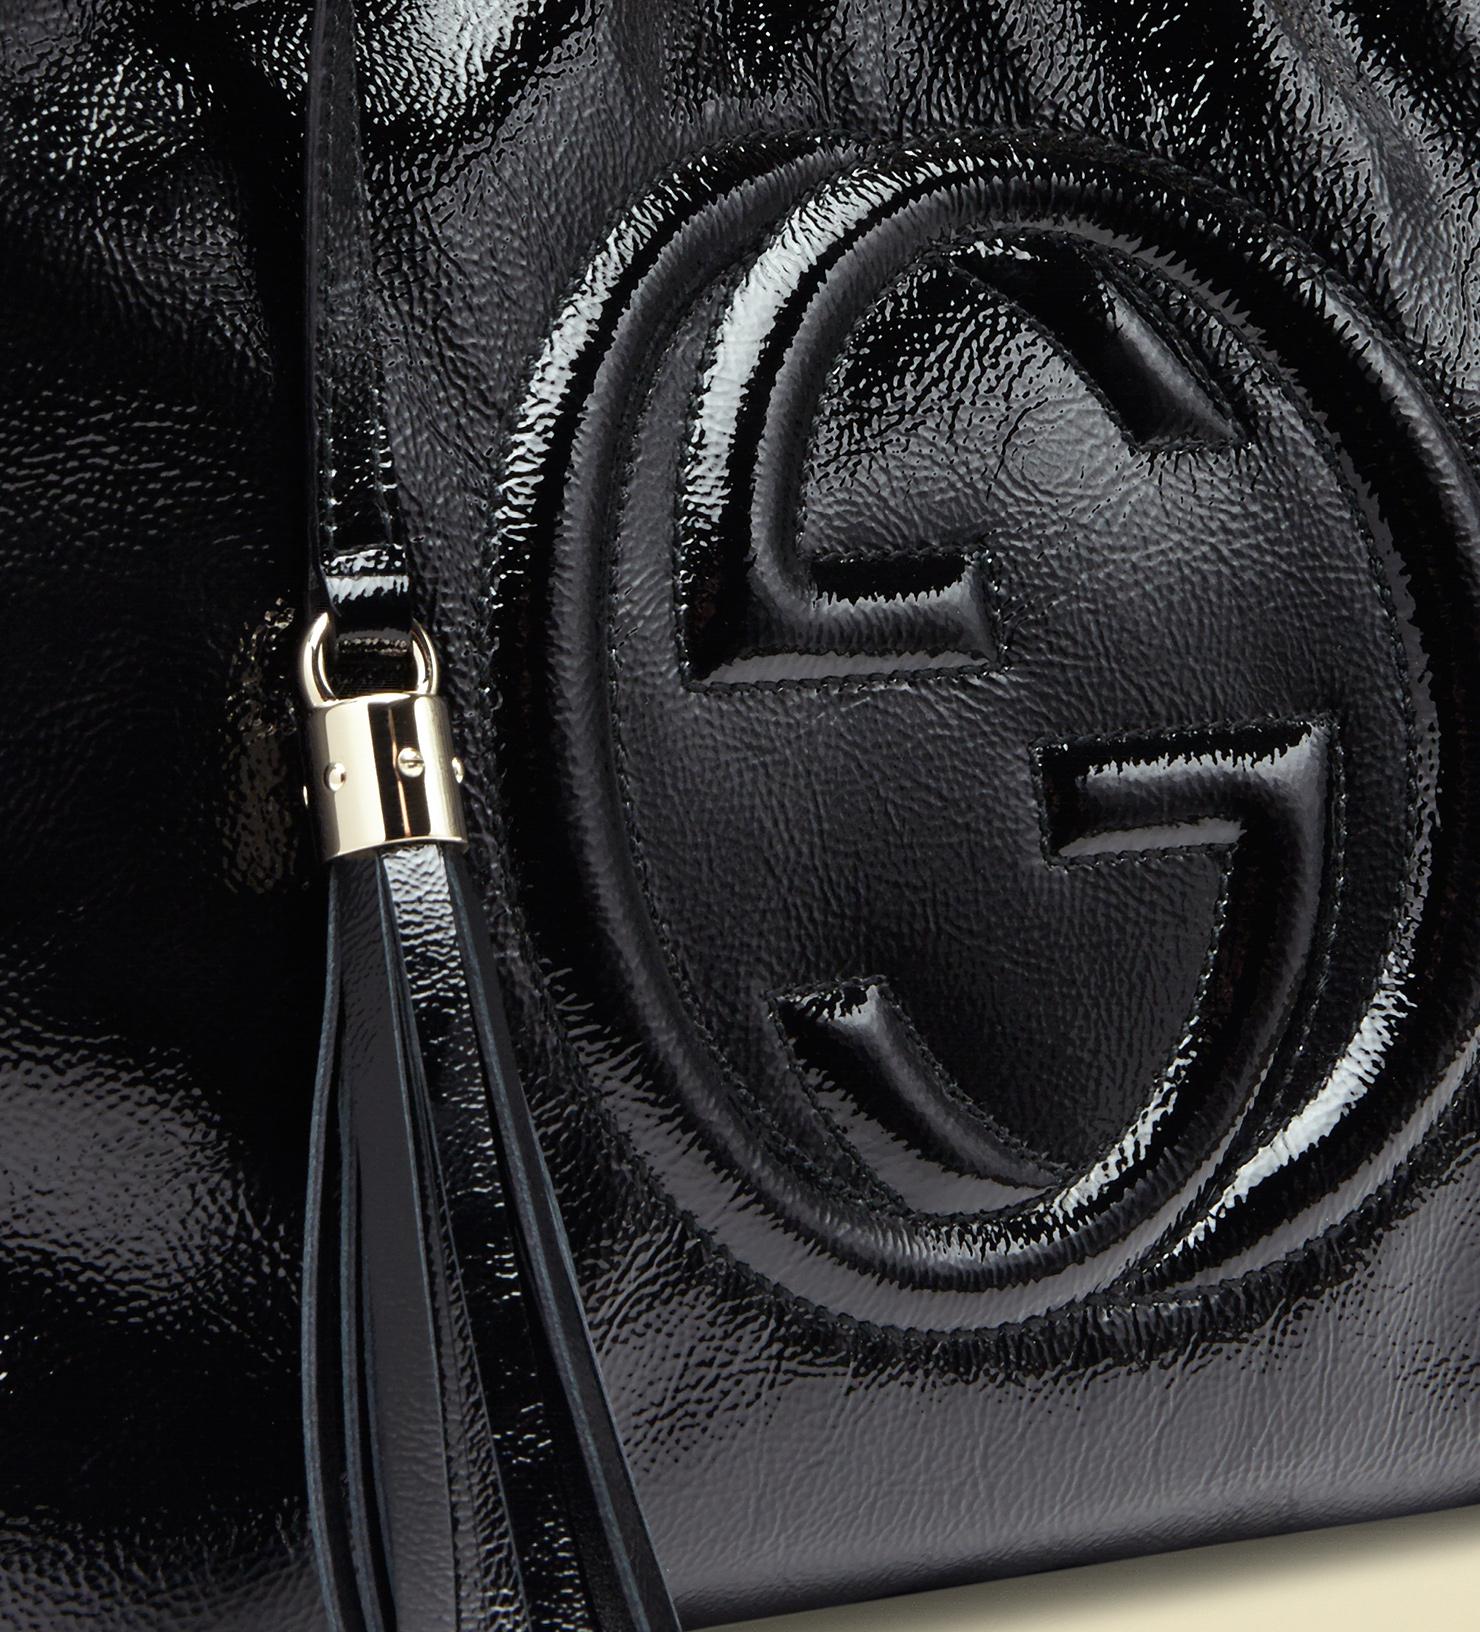 Lyst - Gucci Soho Soft Patent Leather Shoulder Bag in Black 75fc5cfba685a